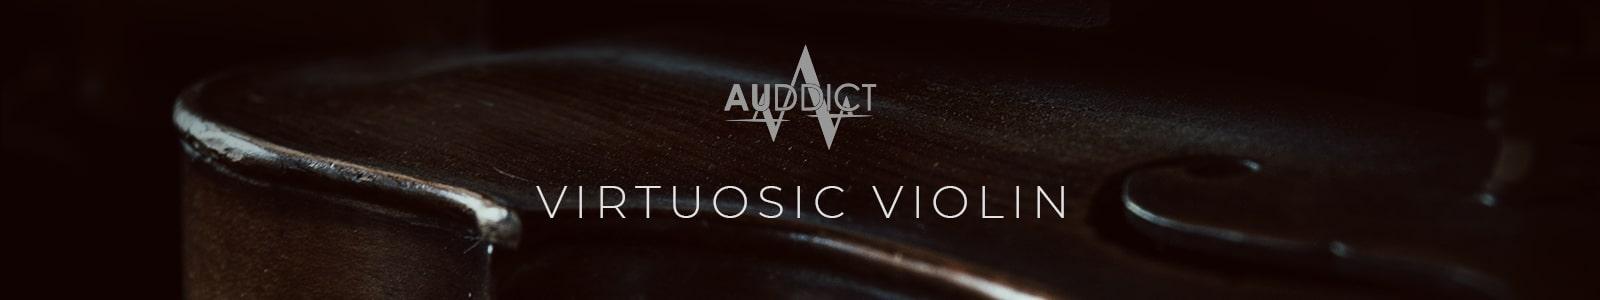 virtuosic violin by auddict